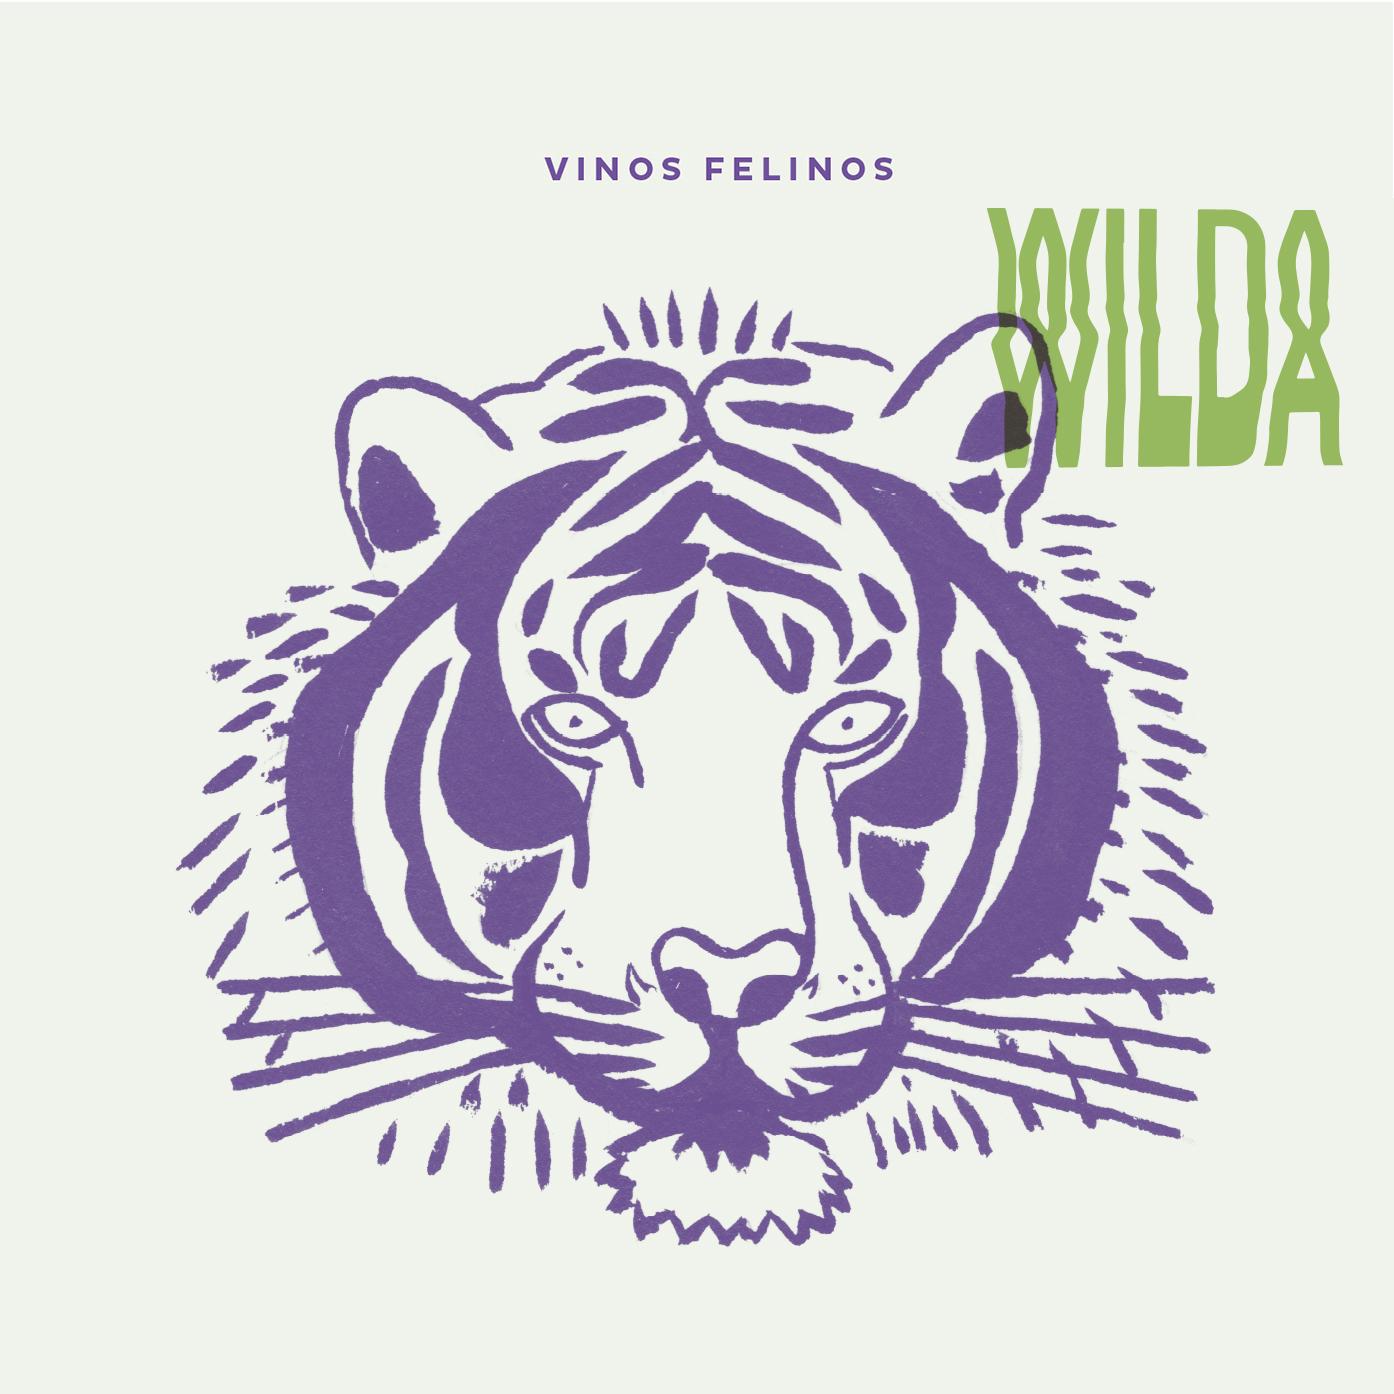 Wilda-ANGEL-ESPINOSA-04d